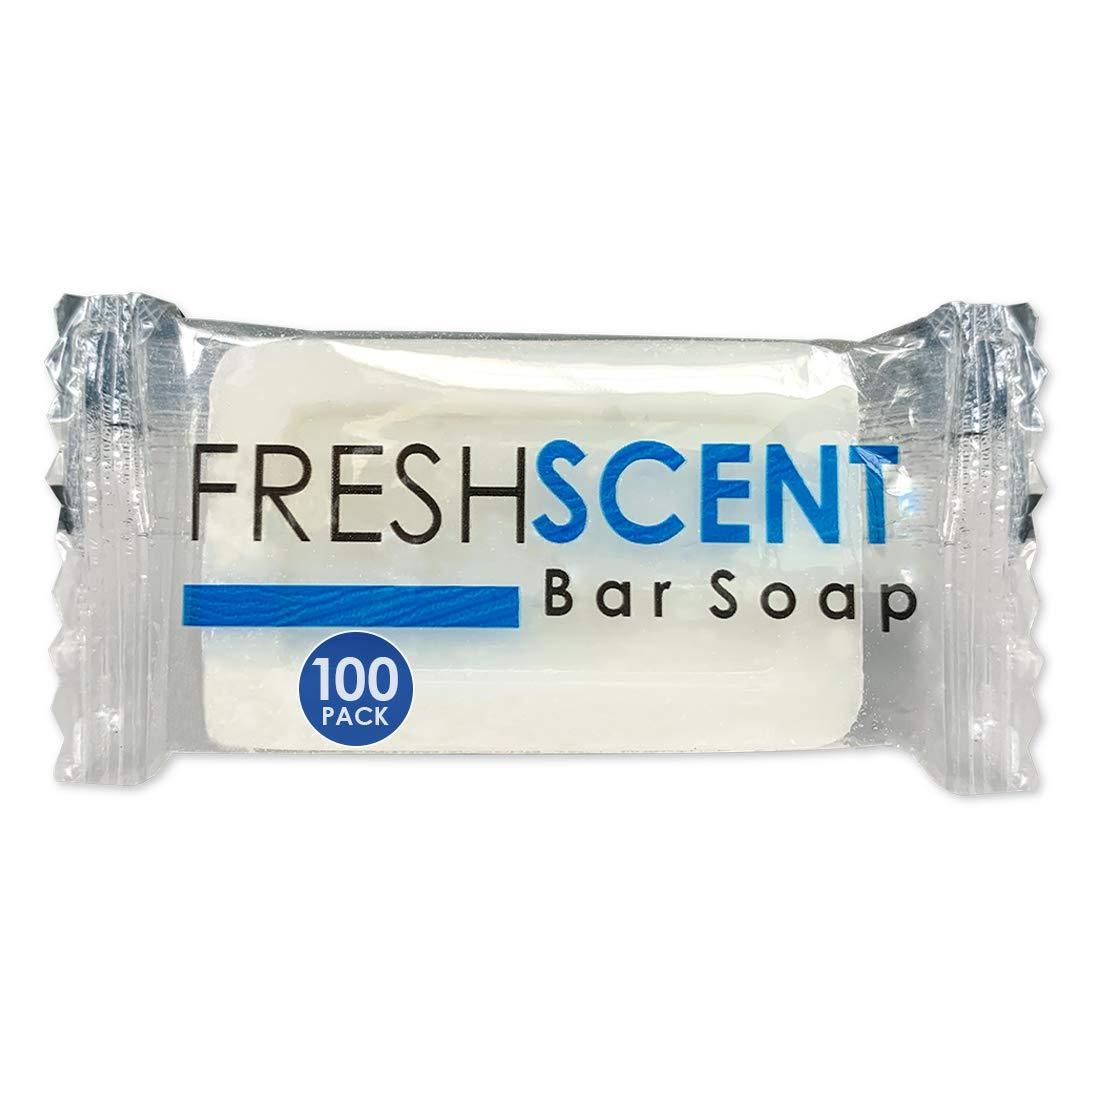 Freshscent 0.50 Oz Bar Soap (vegetable based) 100 Count